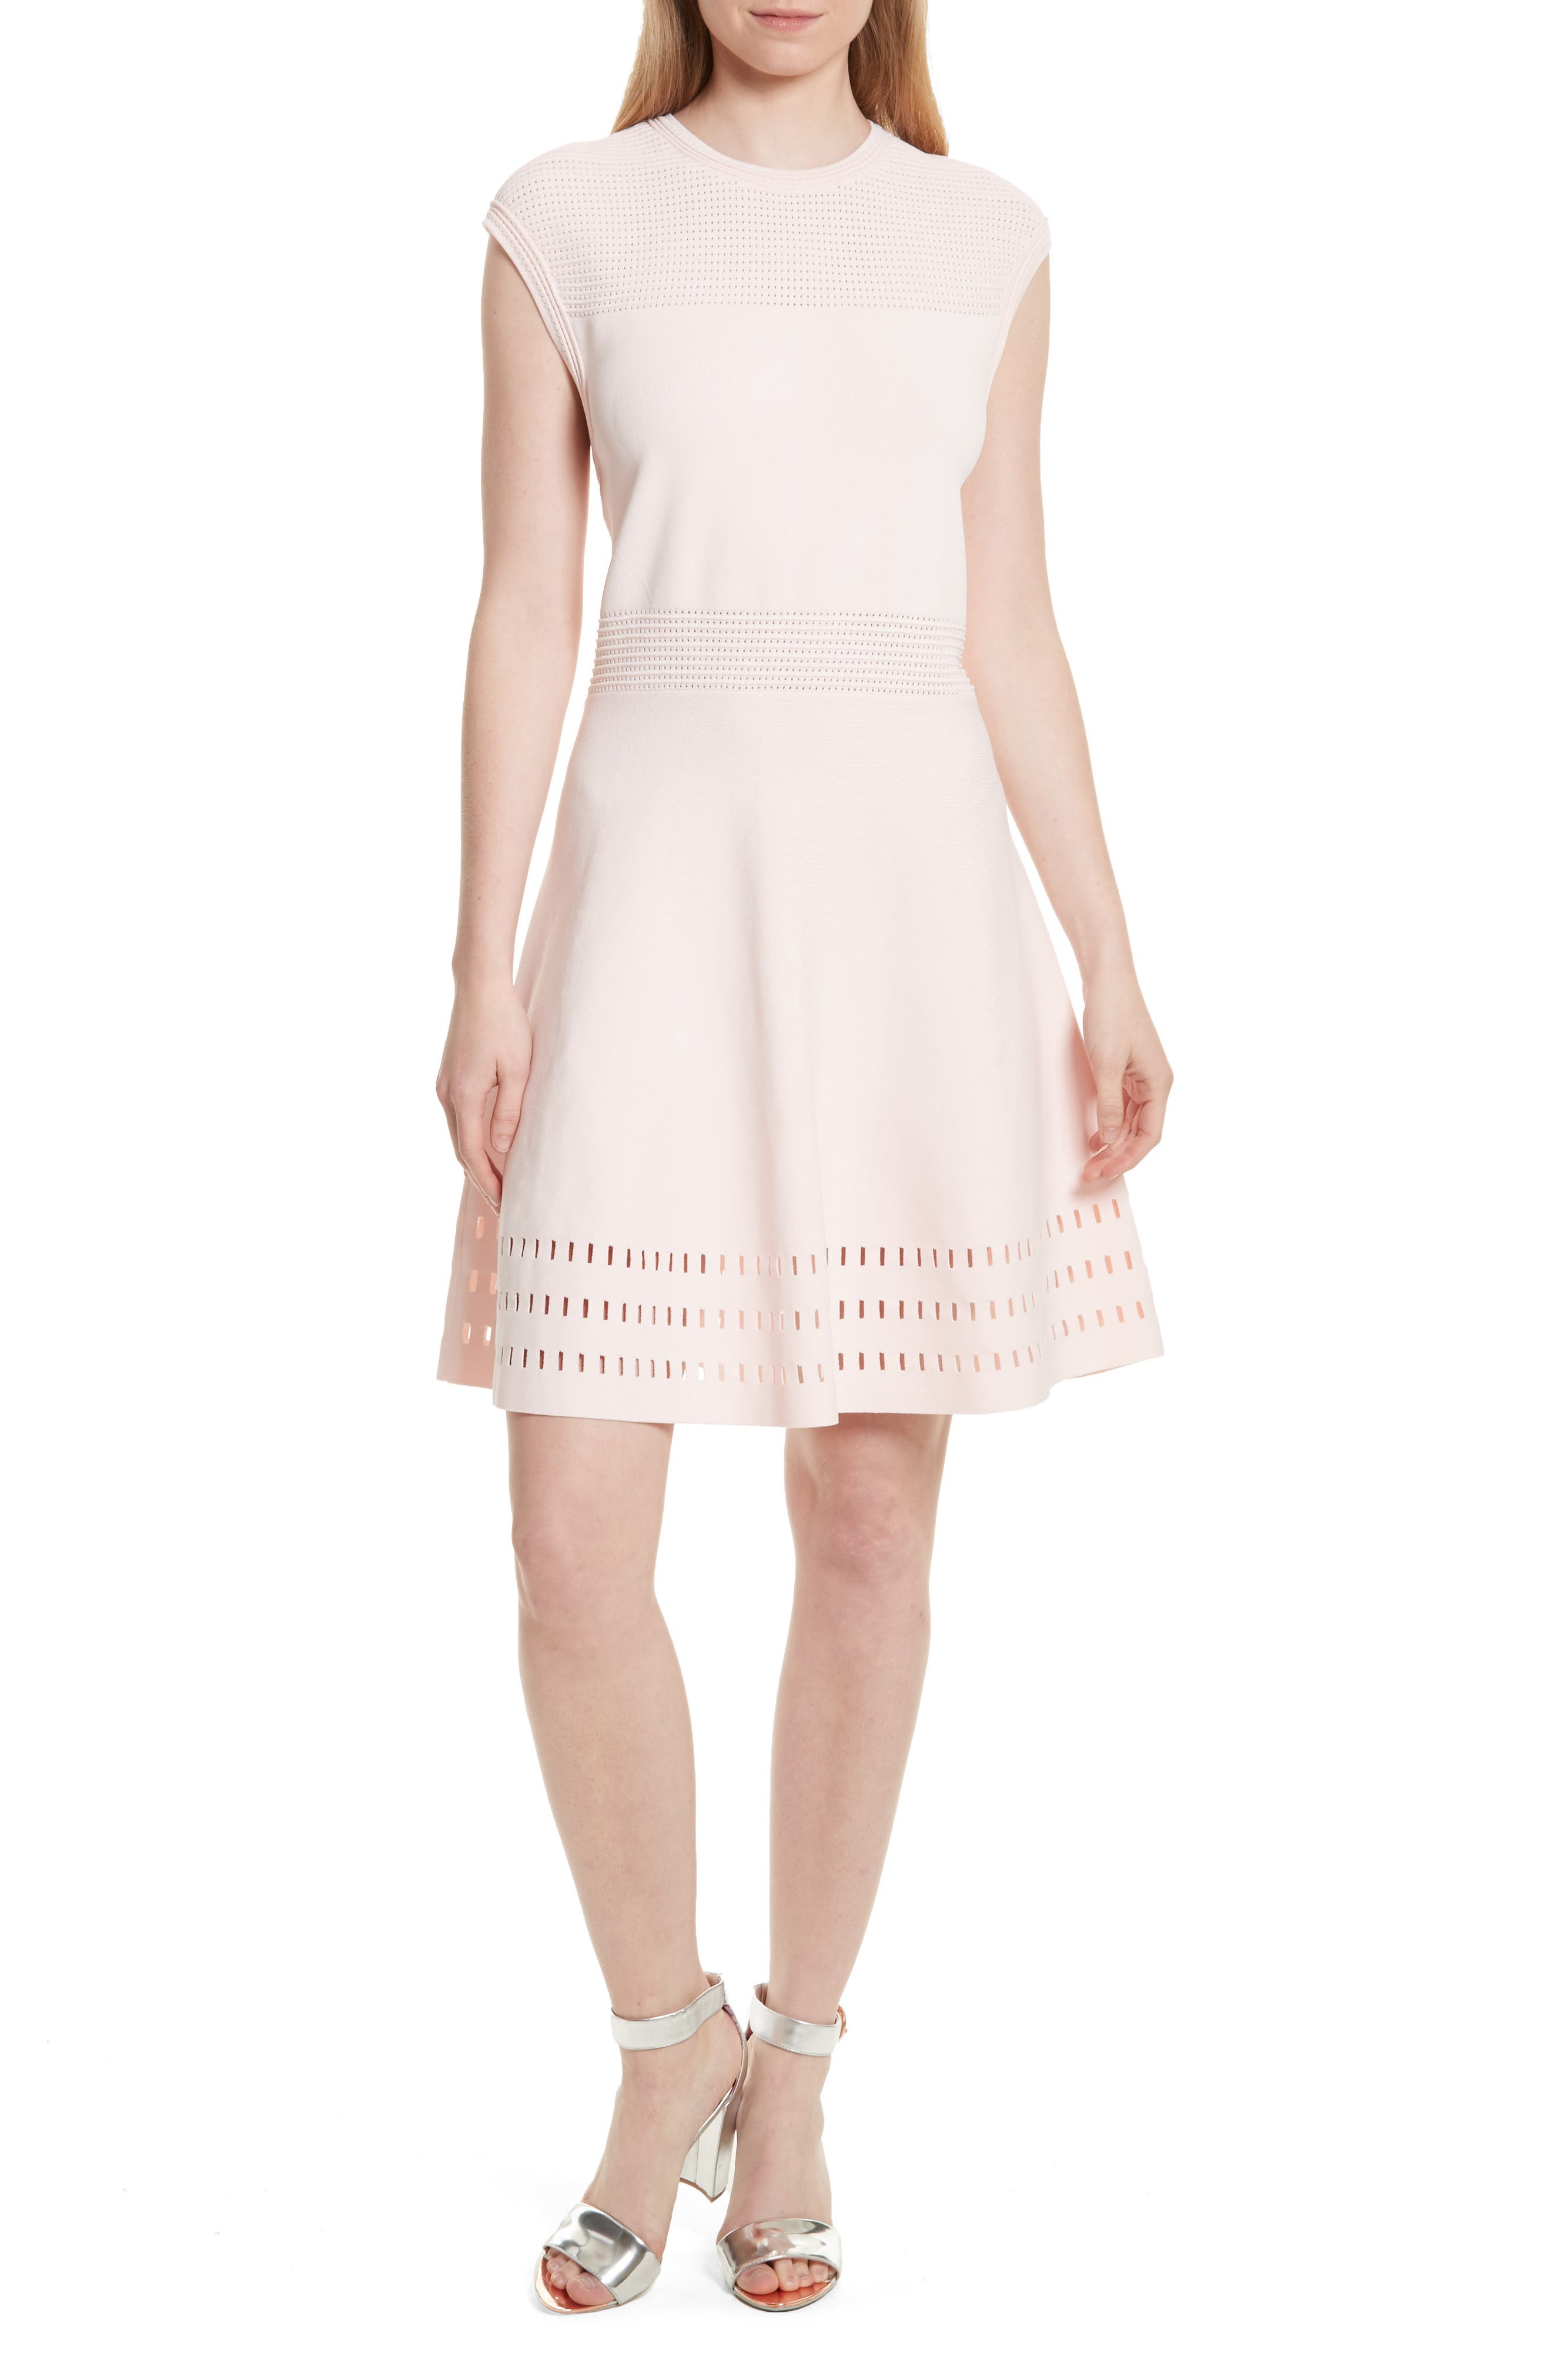 Aurbray Knit Skater Dress,                         Main,                         color, 672